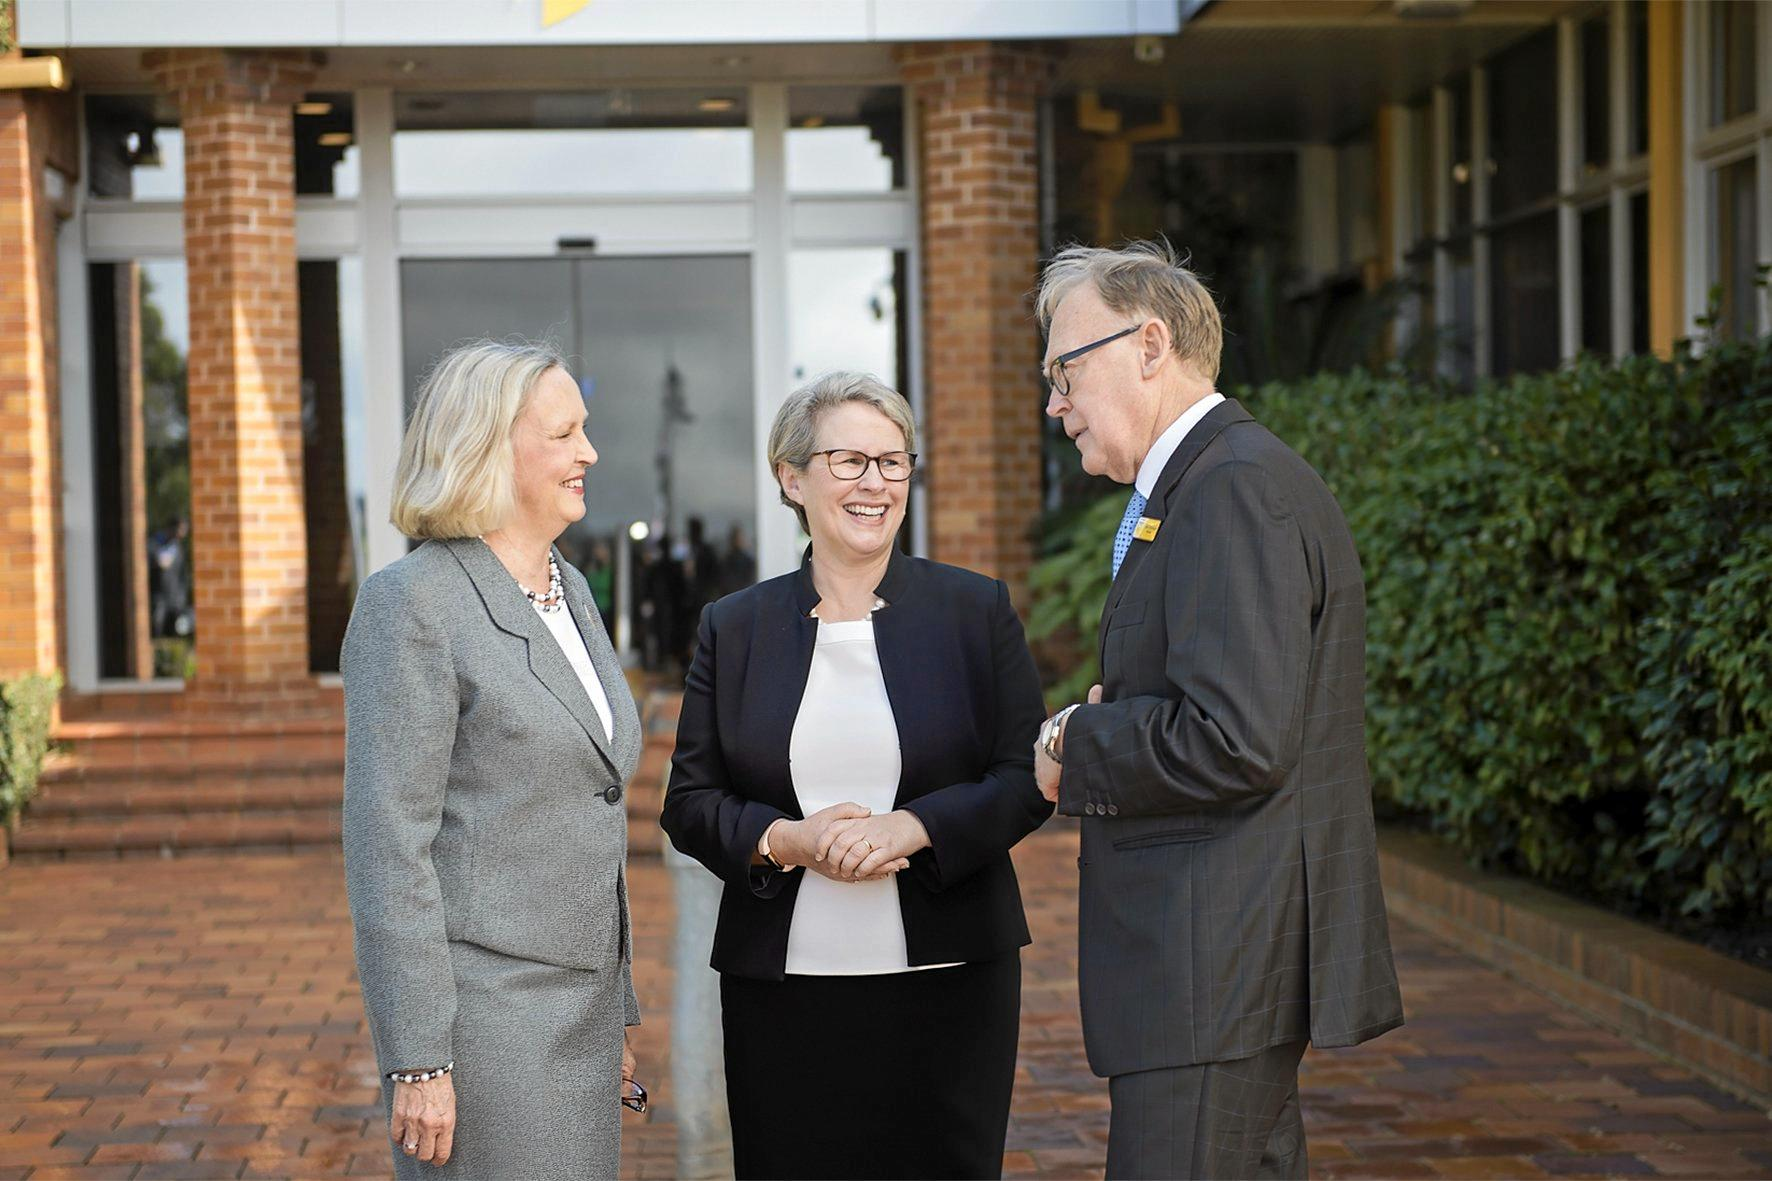 EQUALITY: USQ's Deputy Chancellor Jan Boys (left) with Vice-Chancellor Professor Geraldine Mackenzie and Chancellor John Dornbusch.